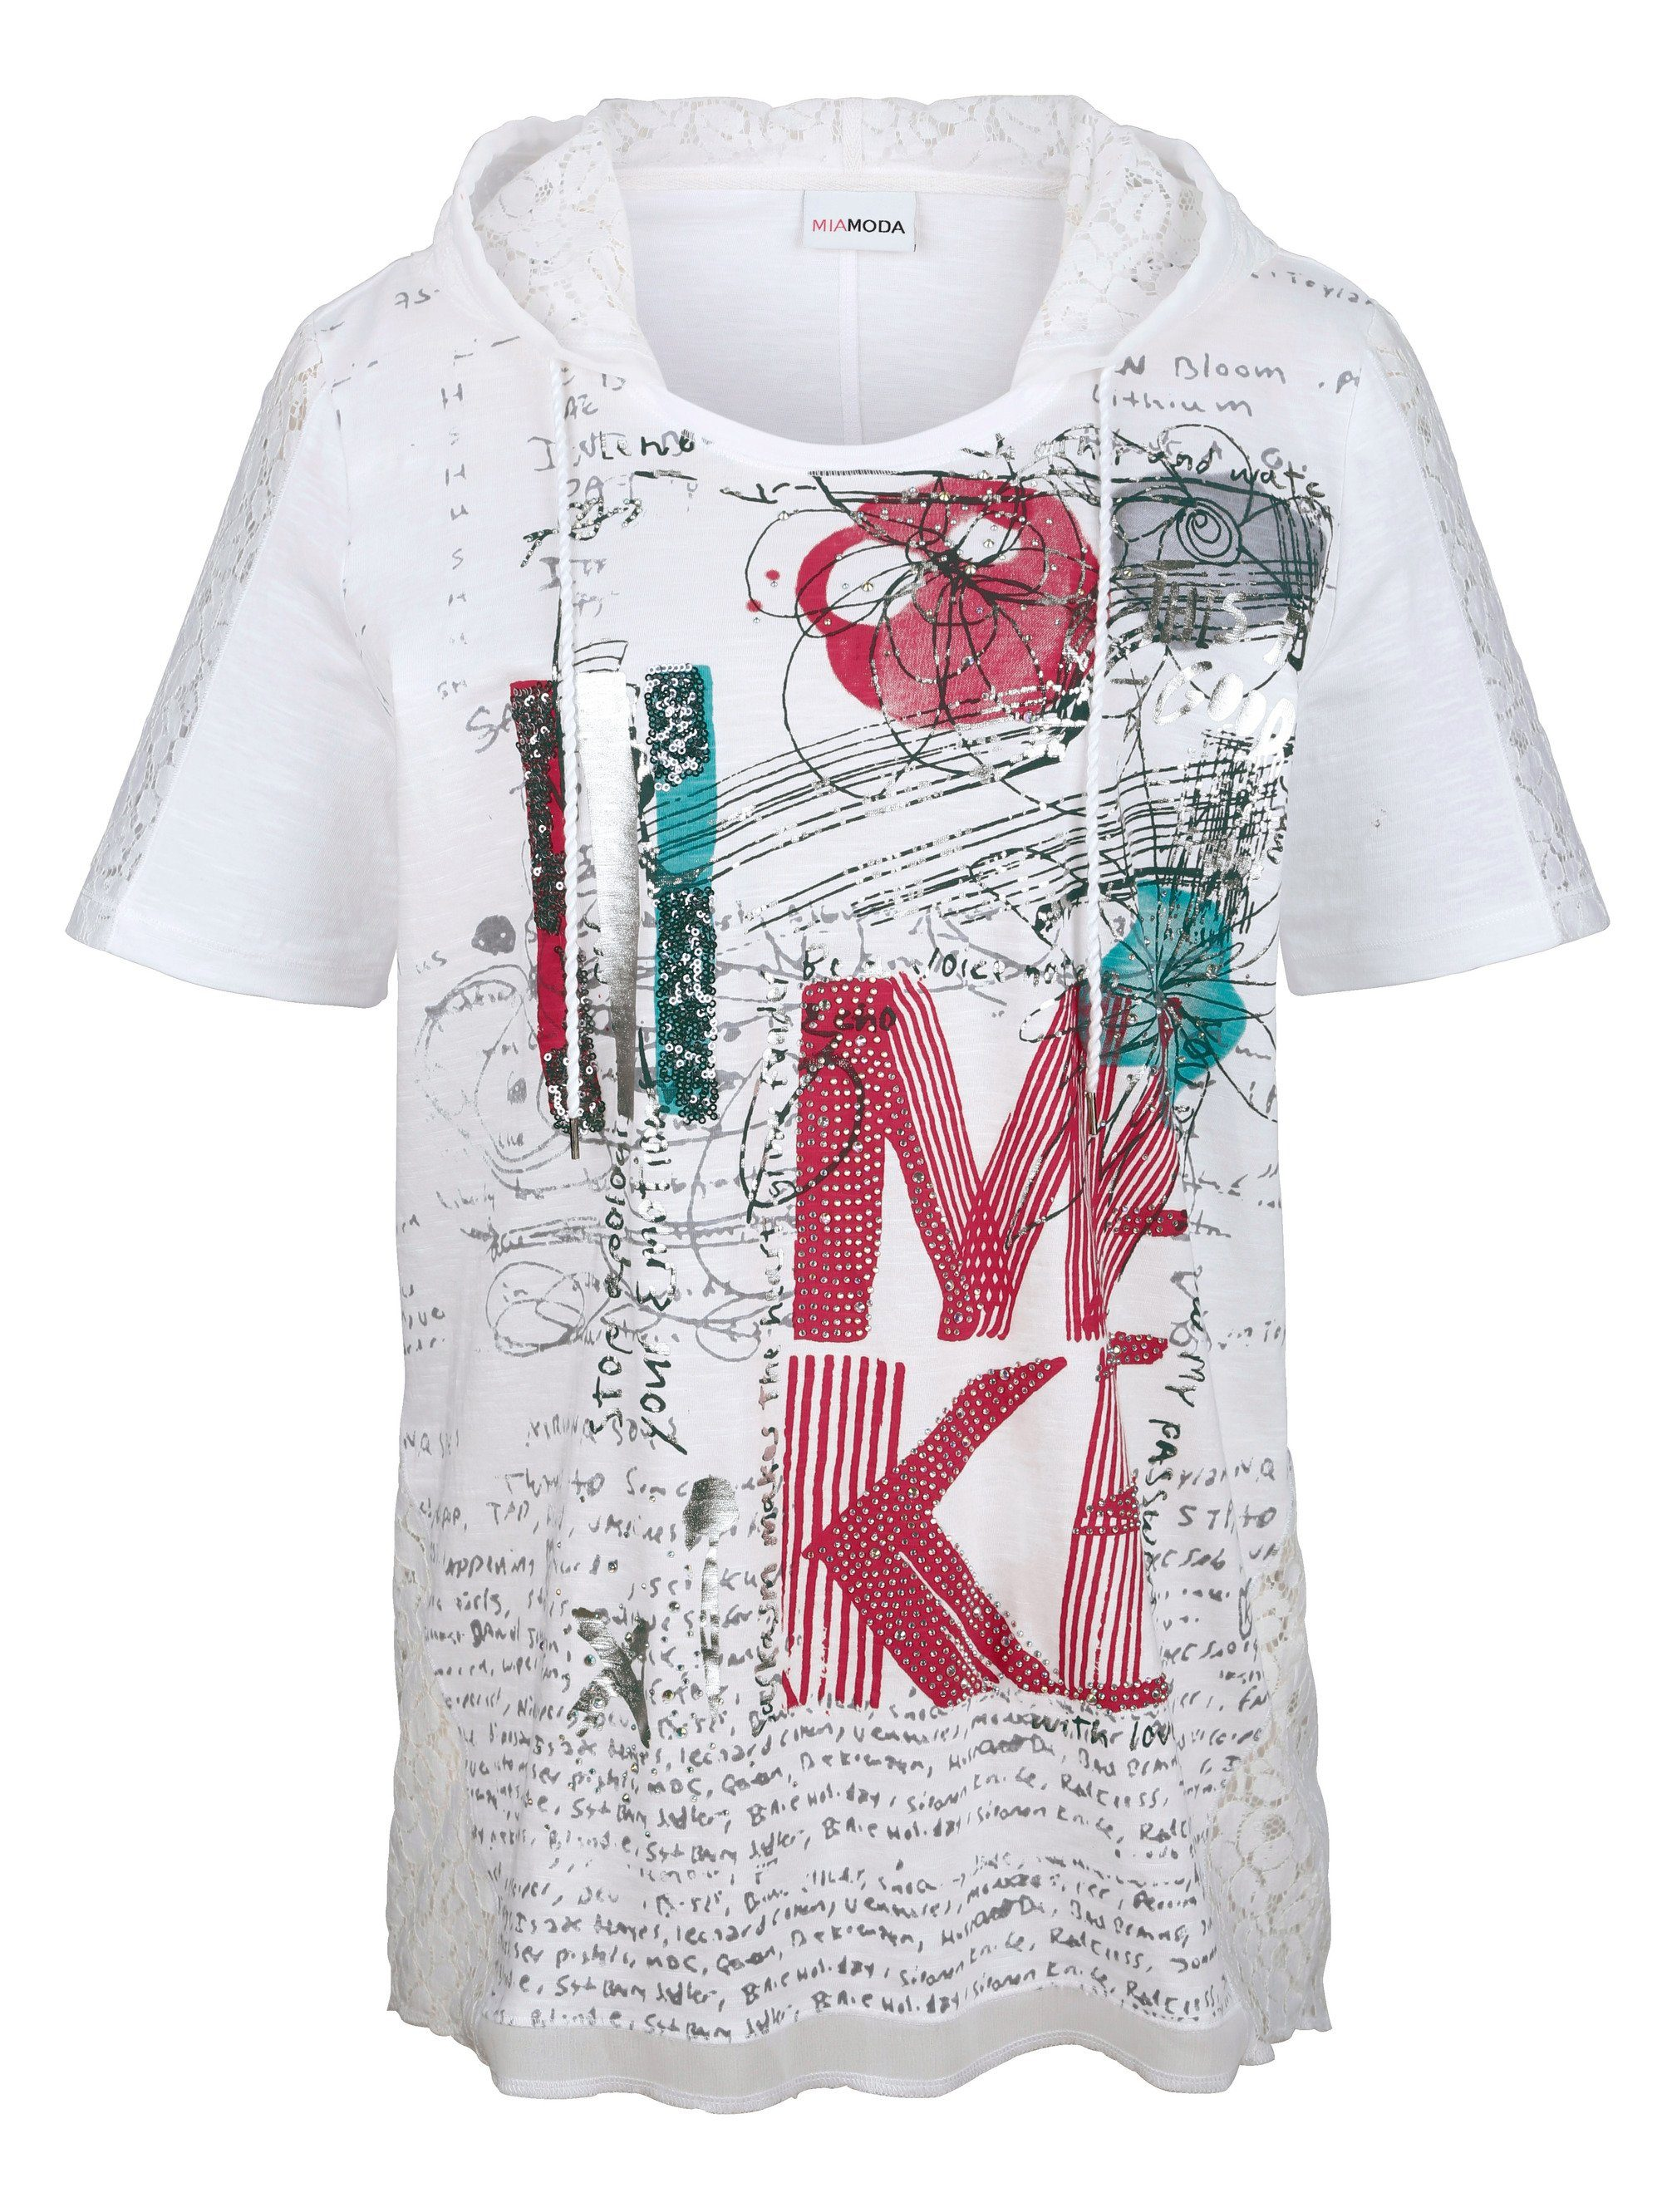 MIAMODA Zipfelshirt mit Kapuze | Bekleidung > Shirts > Zipfelshirts | Weiß | Miamoda